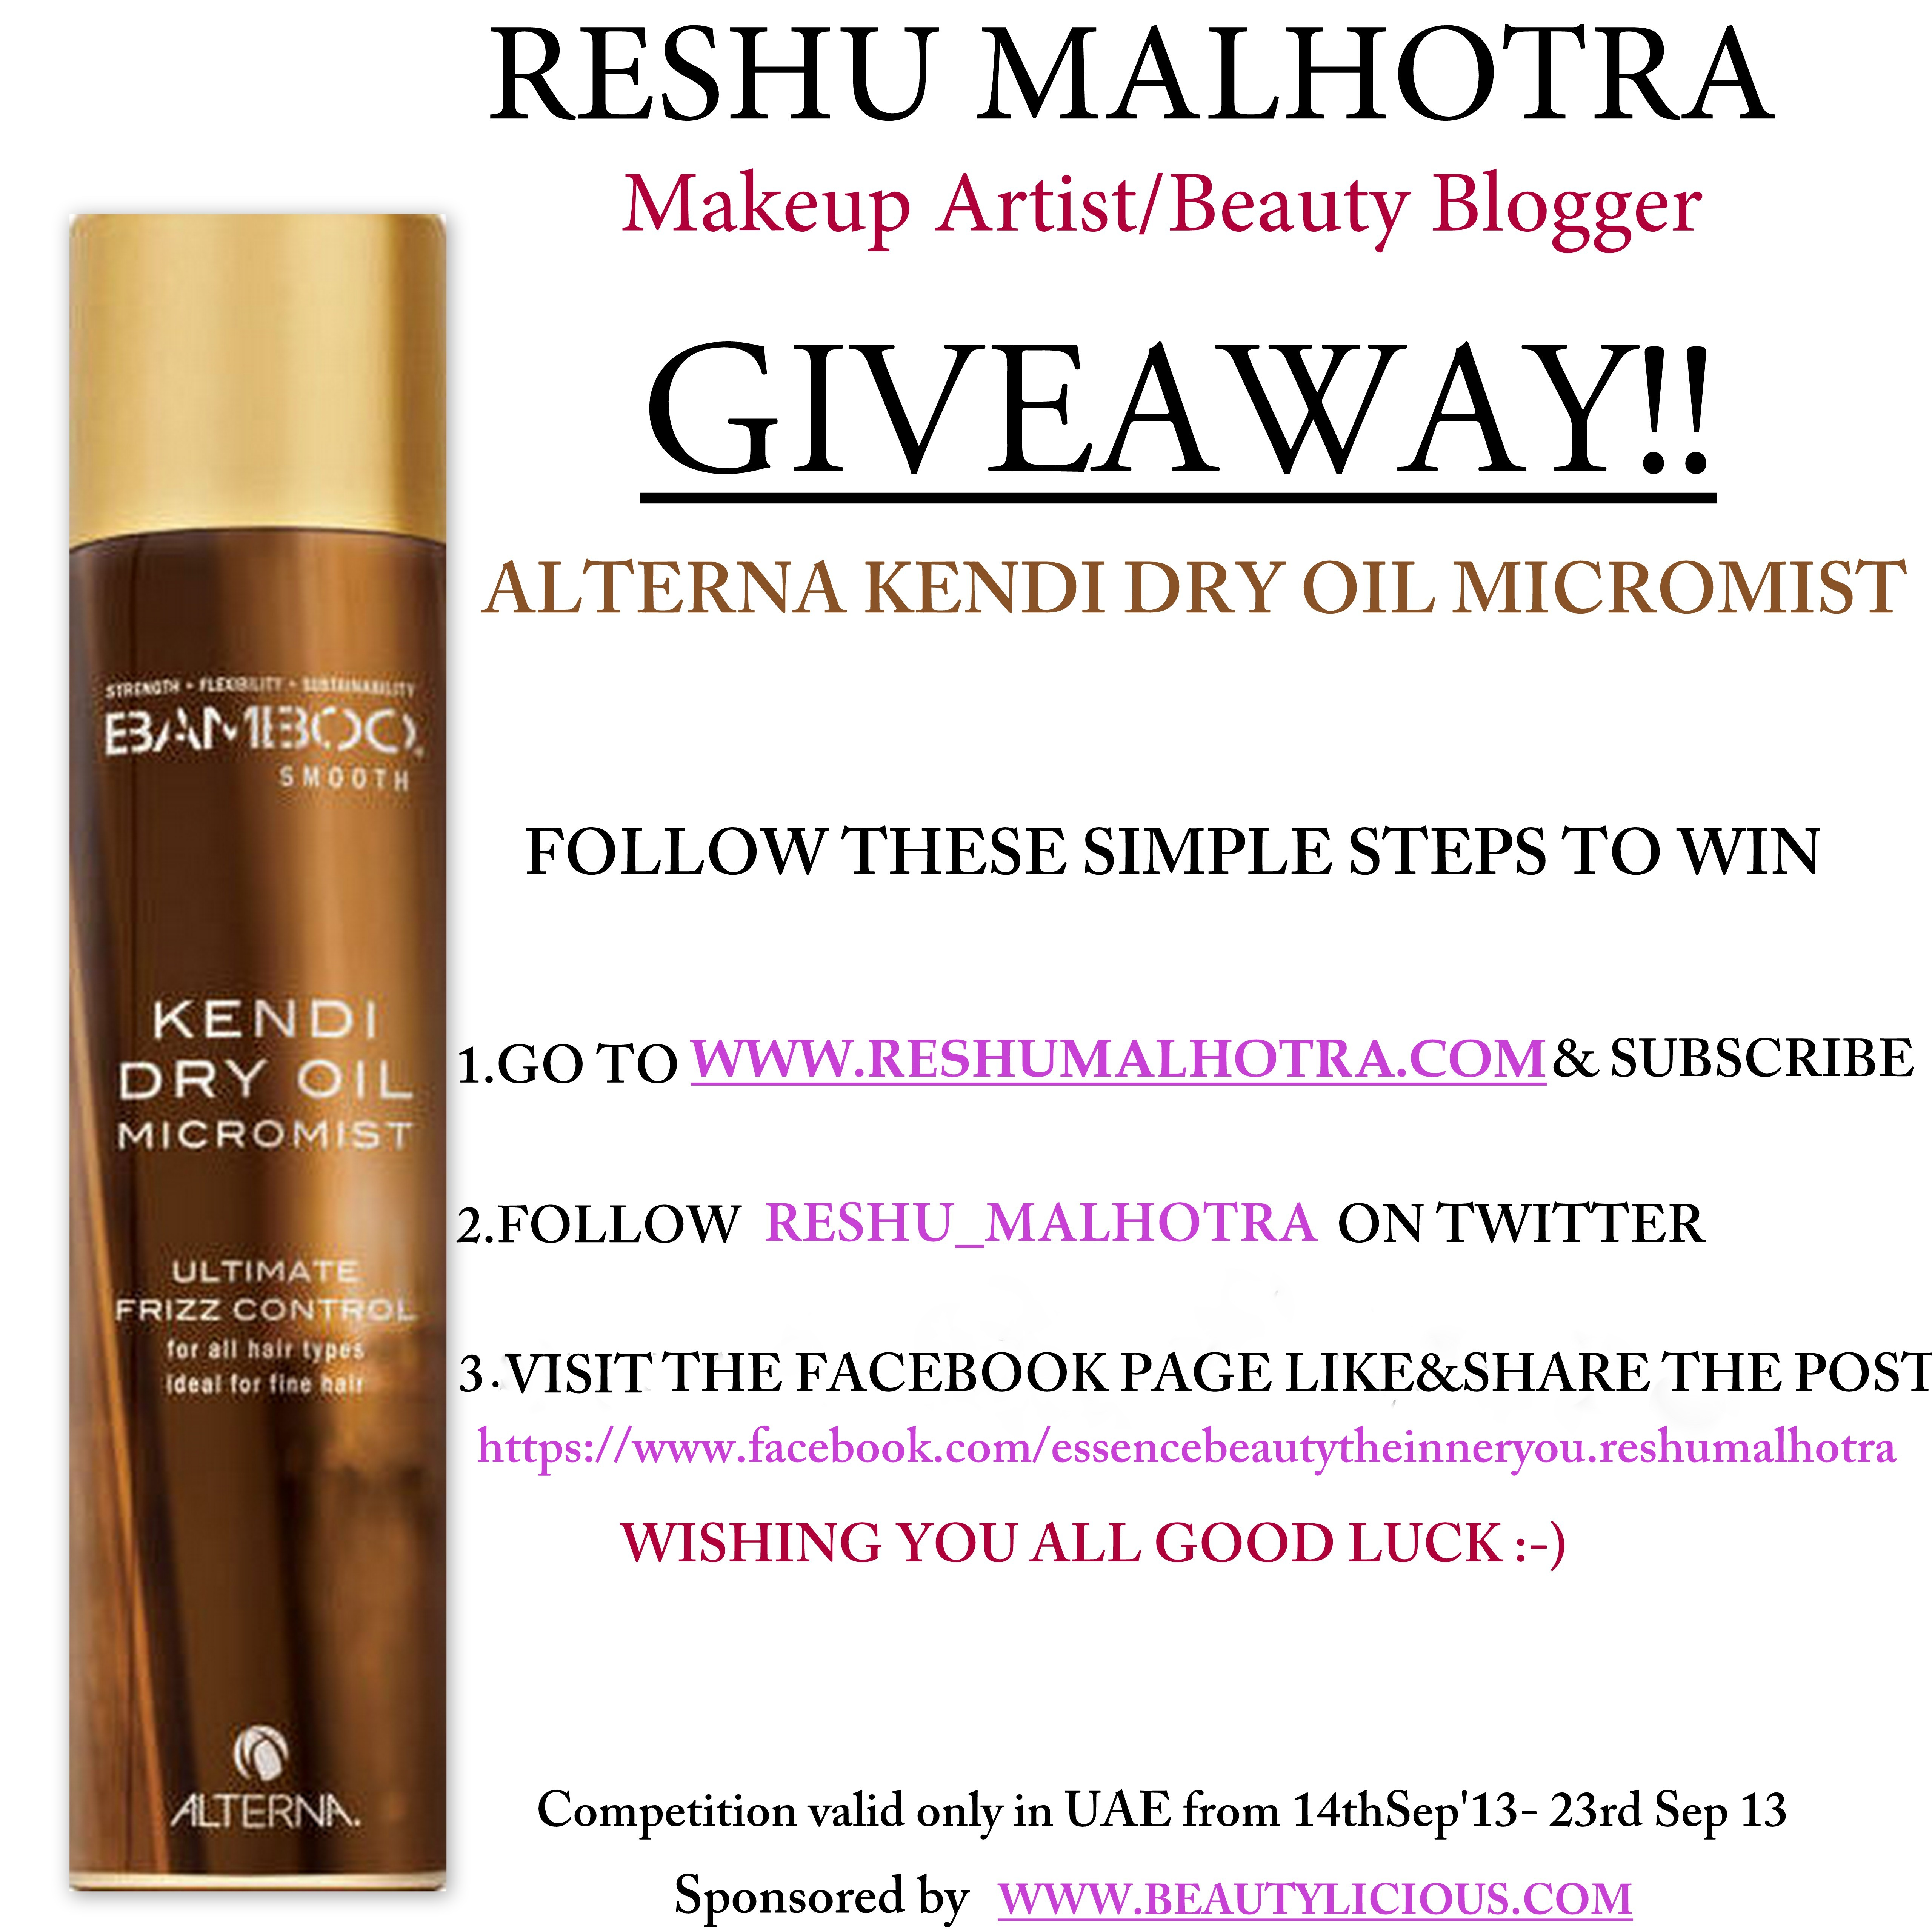 Giveaway/Blog/Reshu Malhotra/Dubai/uae